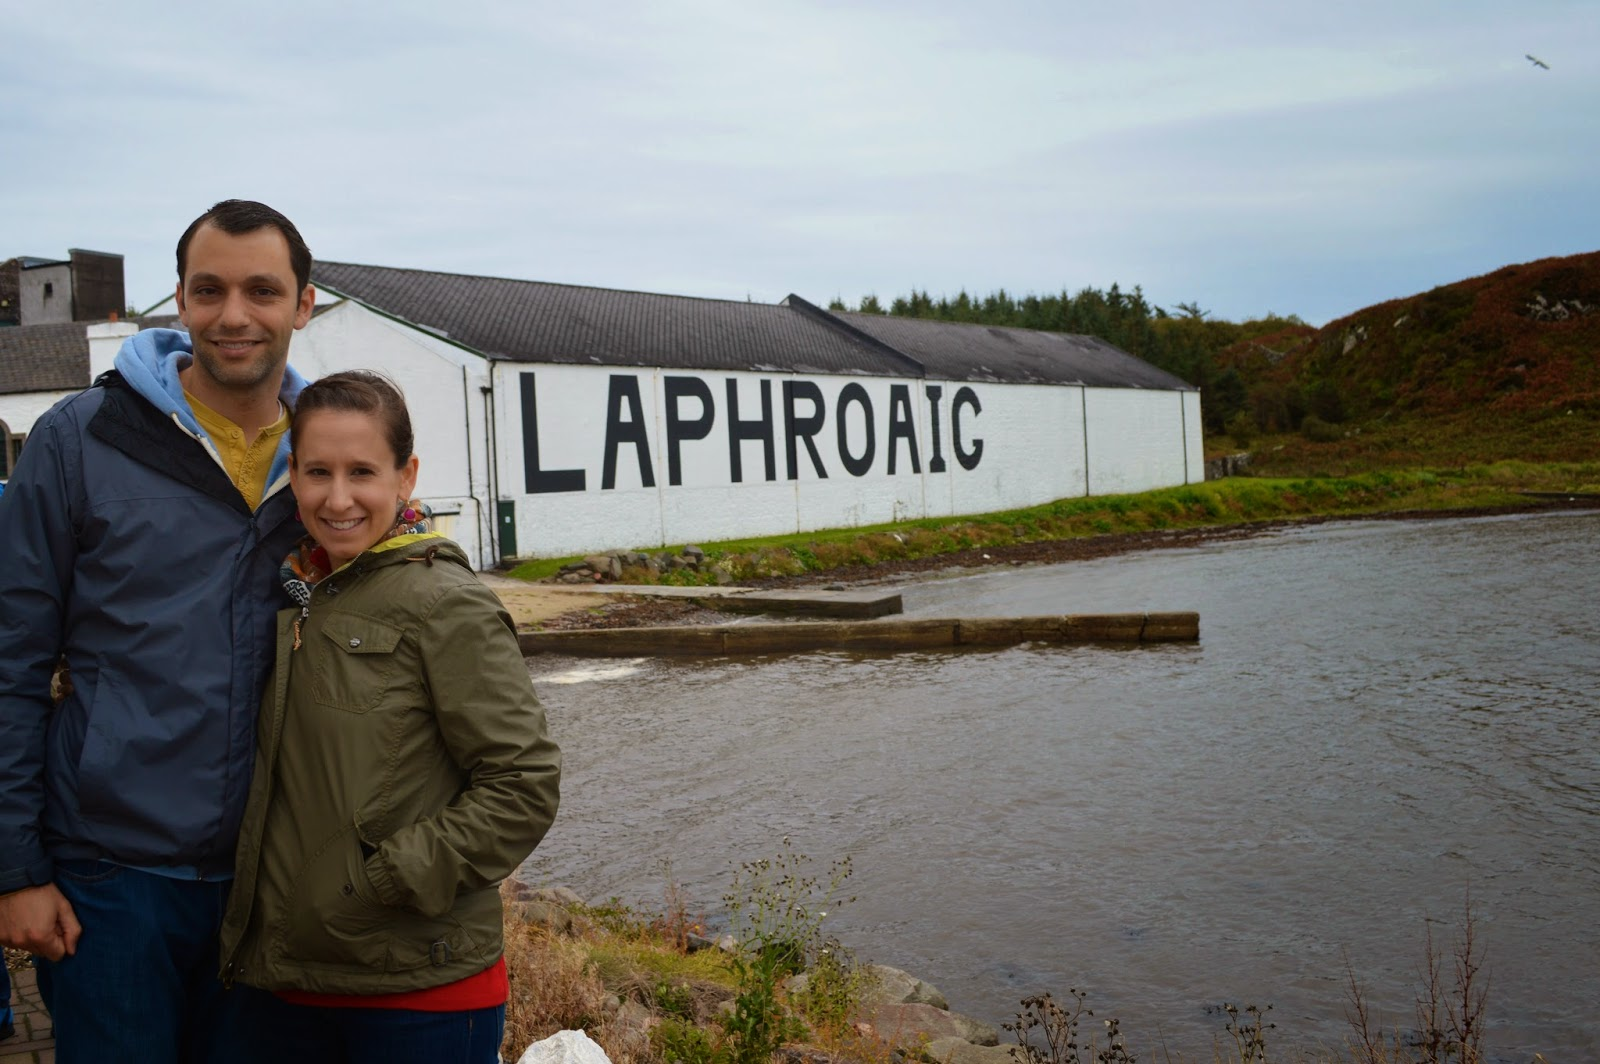 Laphroaig, Isle of Islay, Scotland